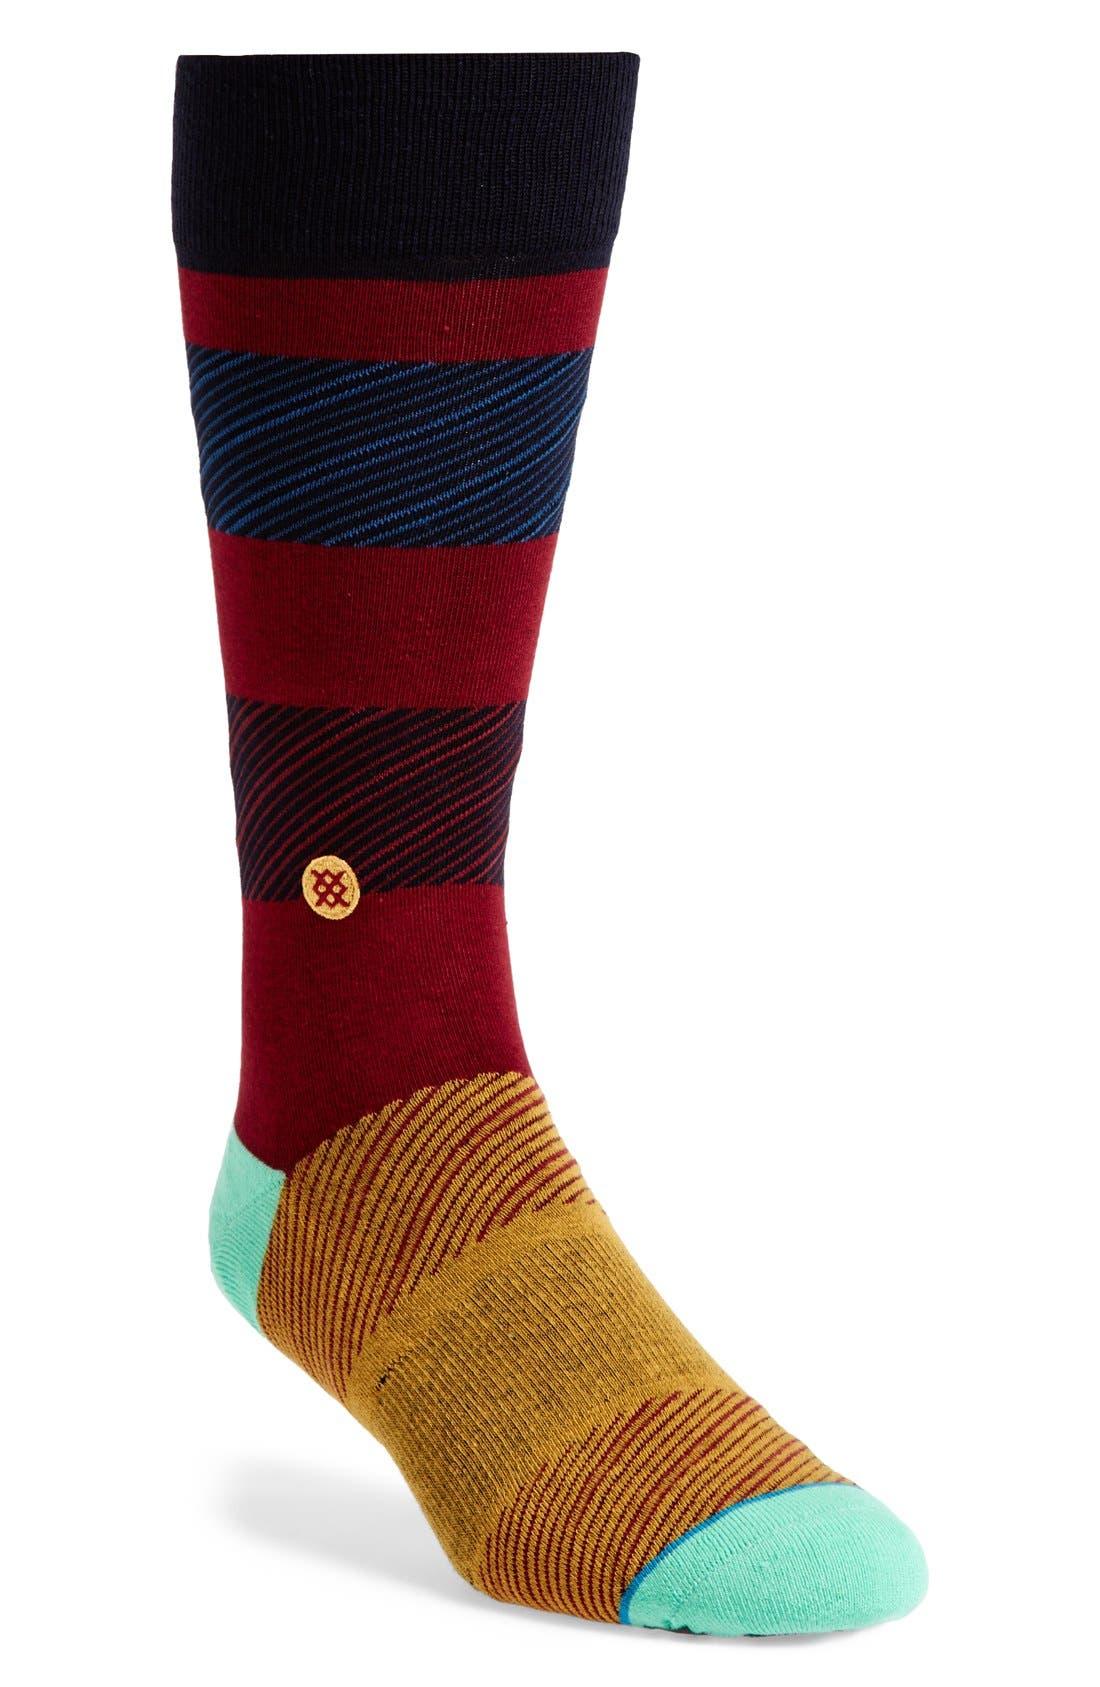 Alternate Image 1 Selected - Stance 'Wagner' Socks